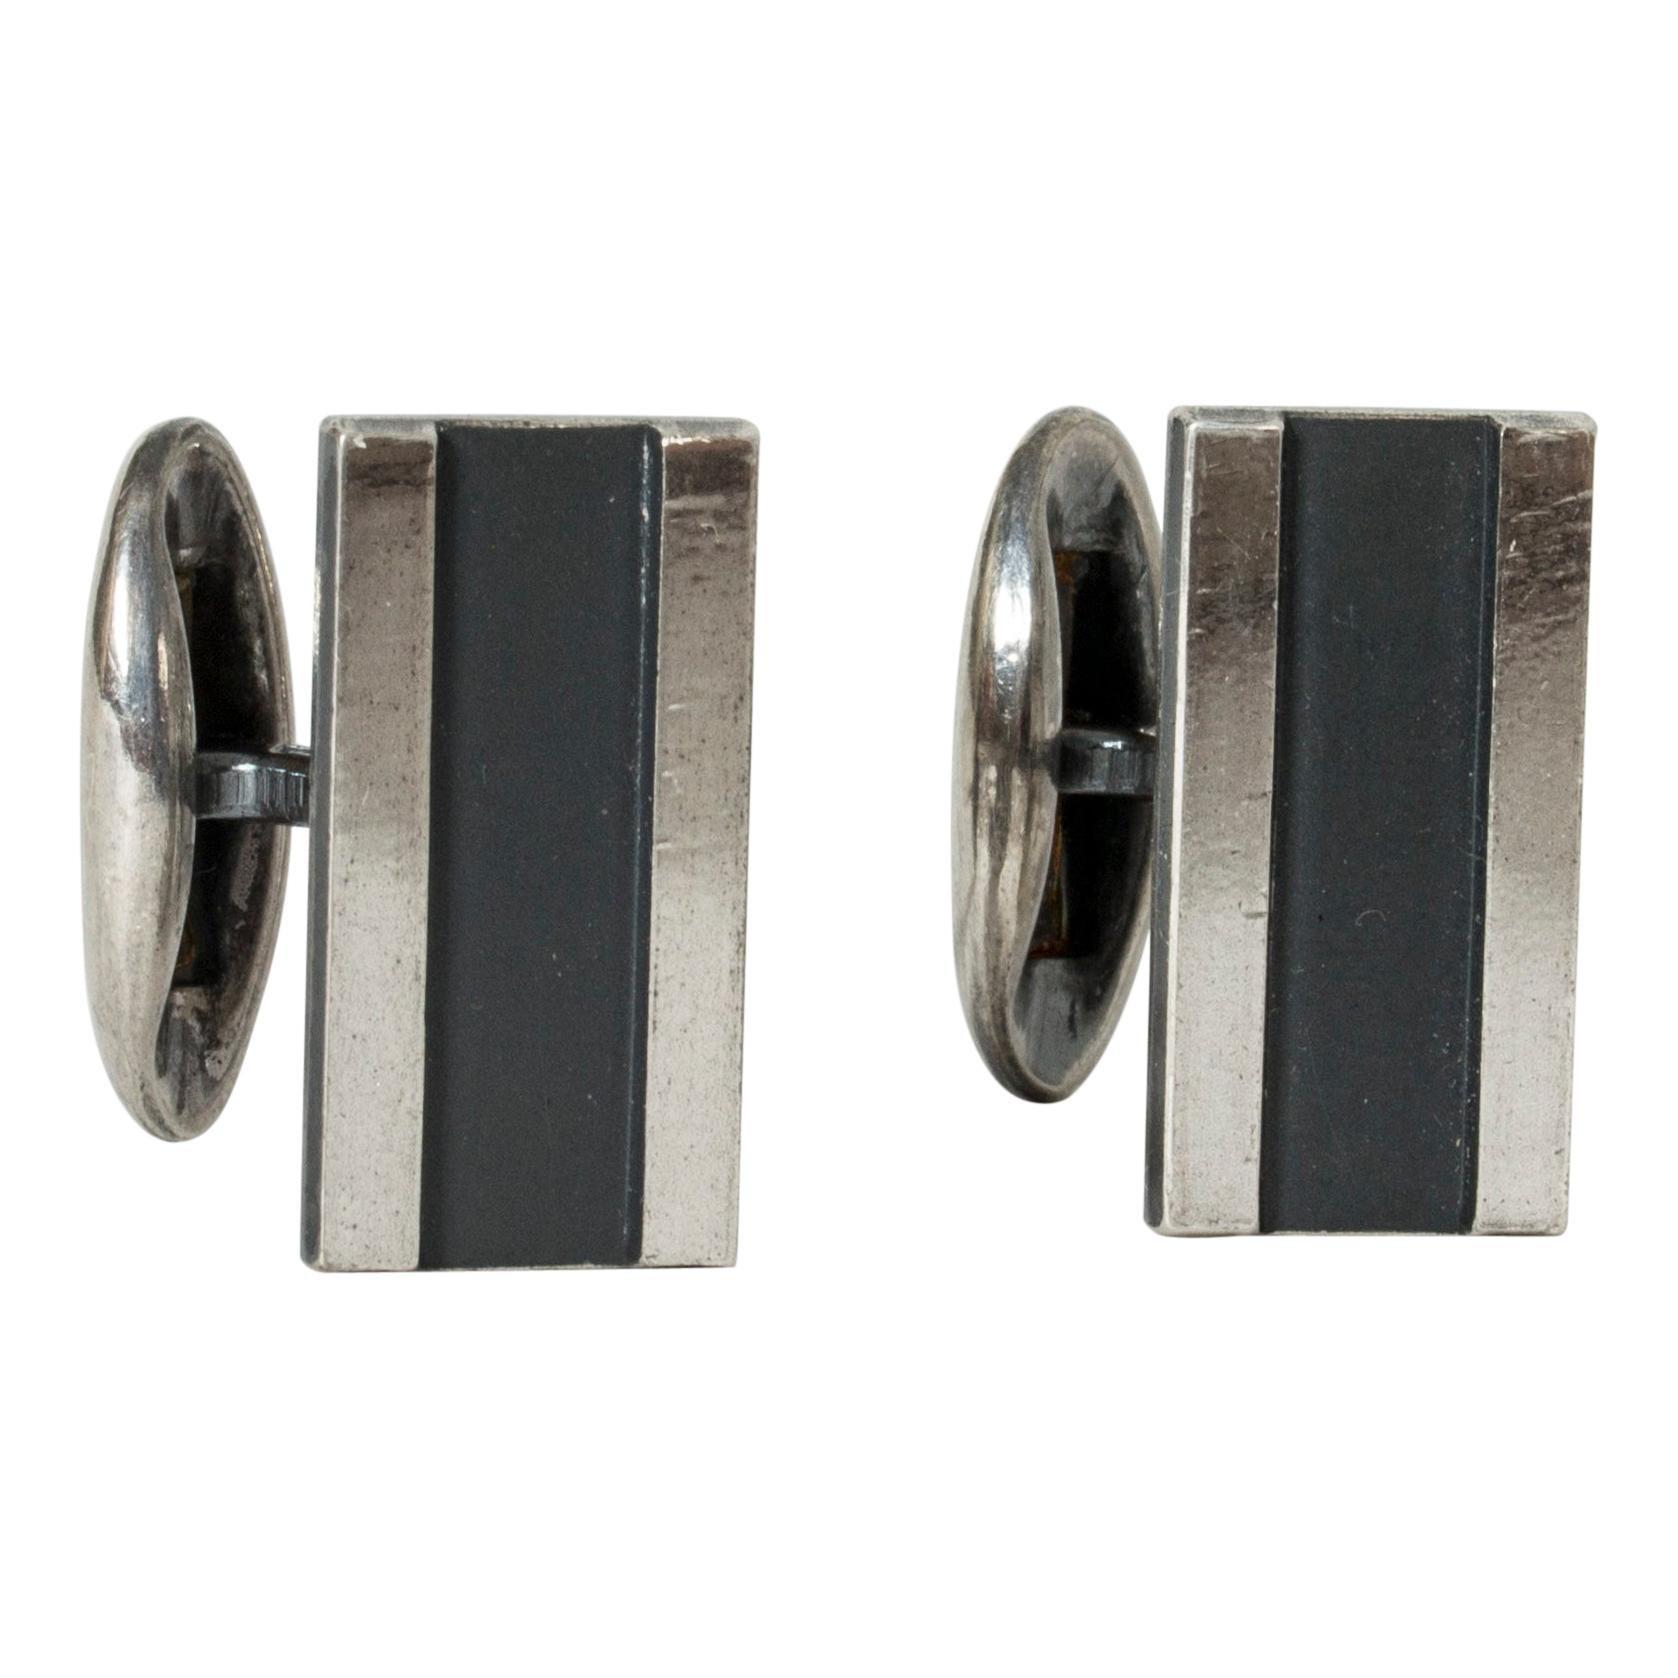 Pair of Silver Cufflinks from Sporrong, Sweden, 1970